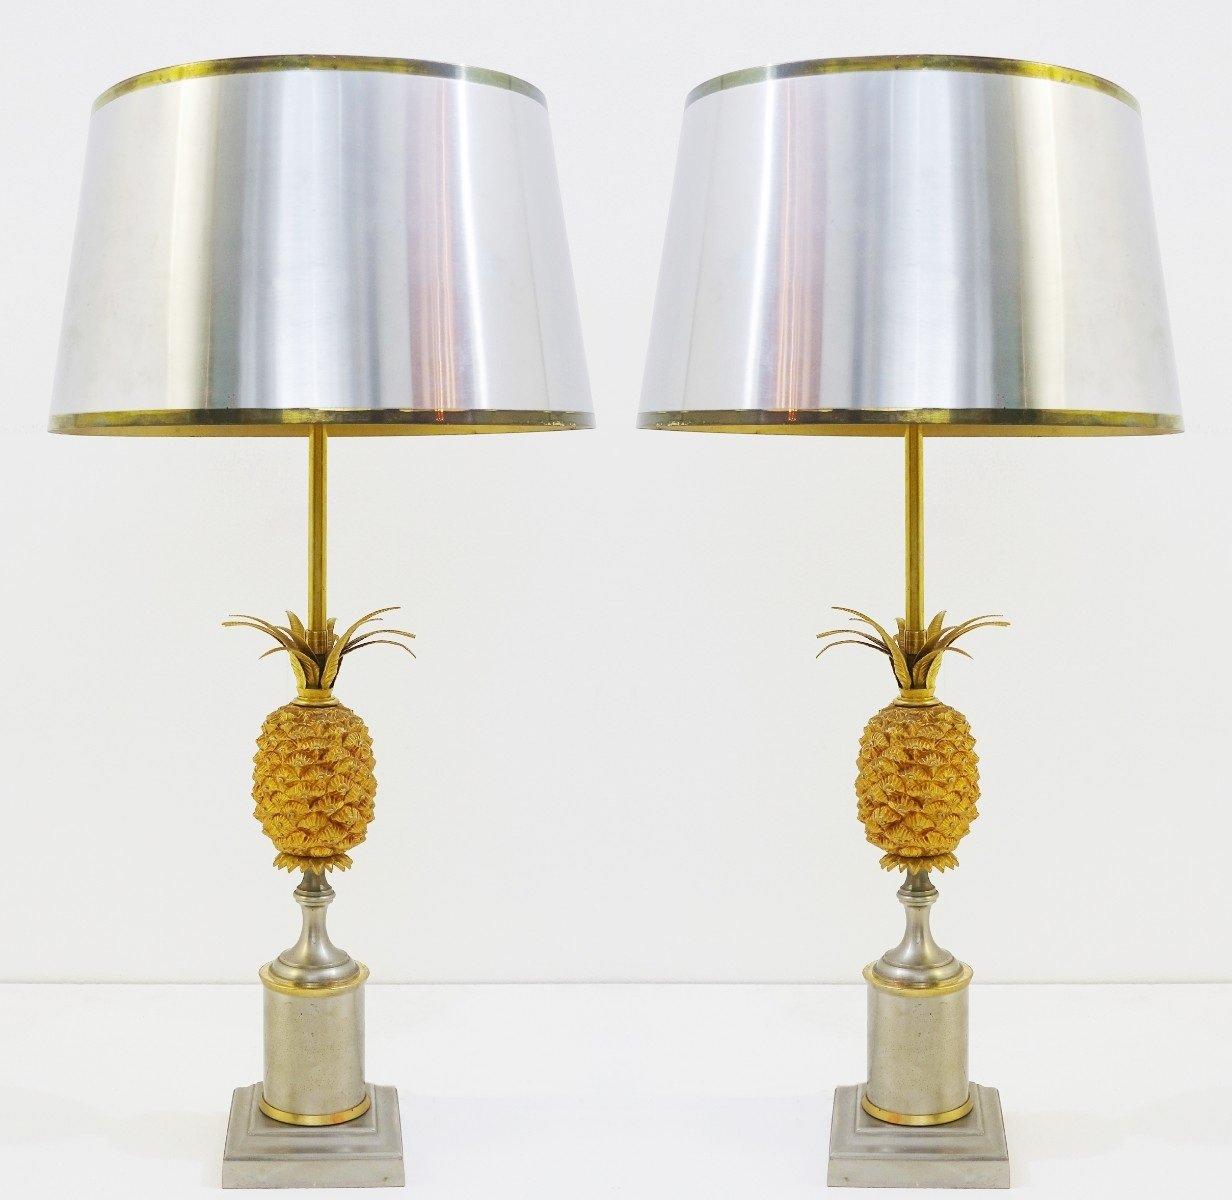 Vintage Pineapple Lamps, Set of 2